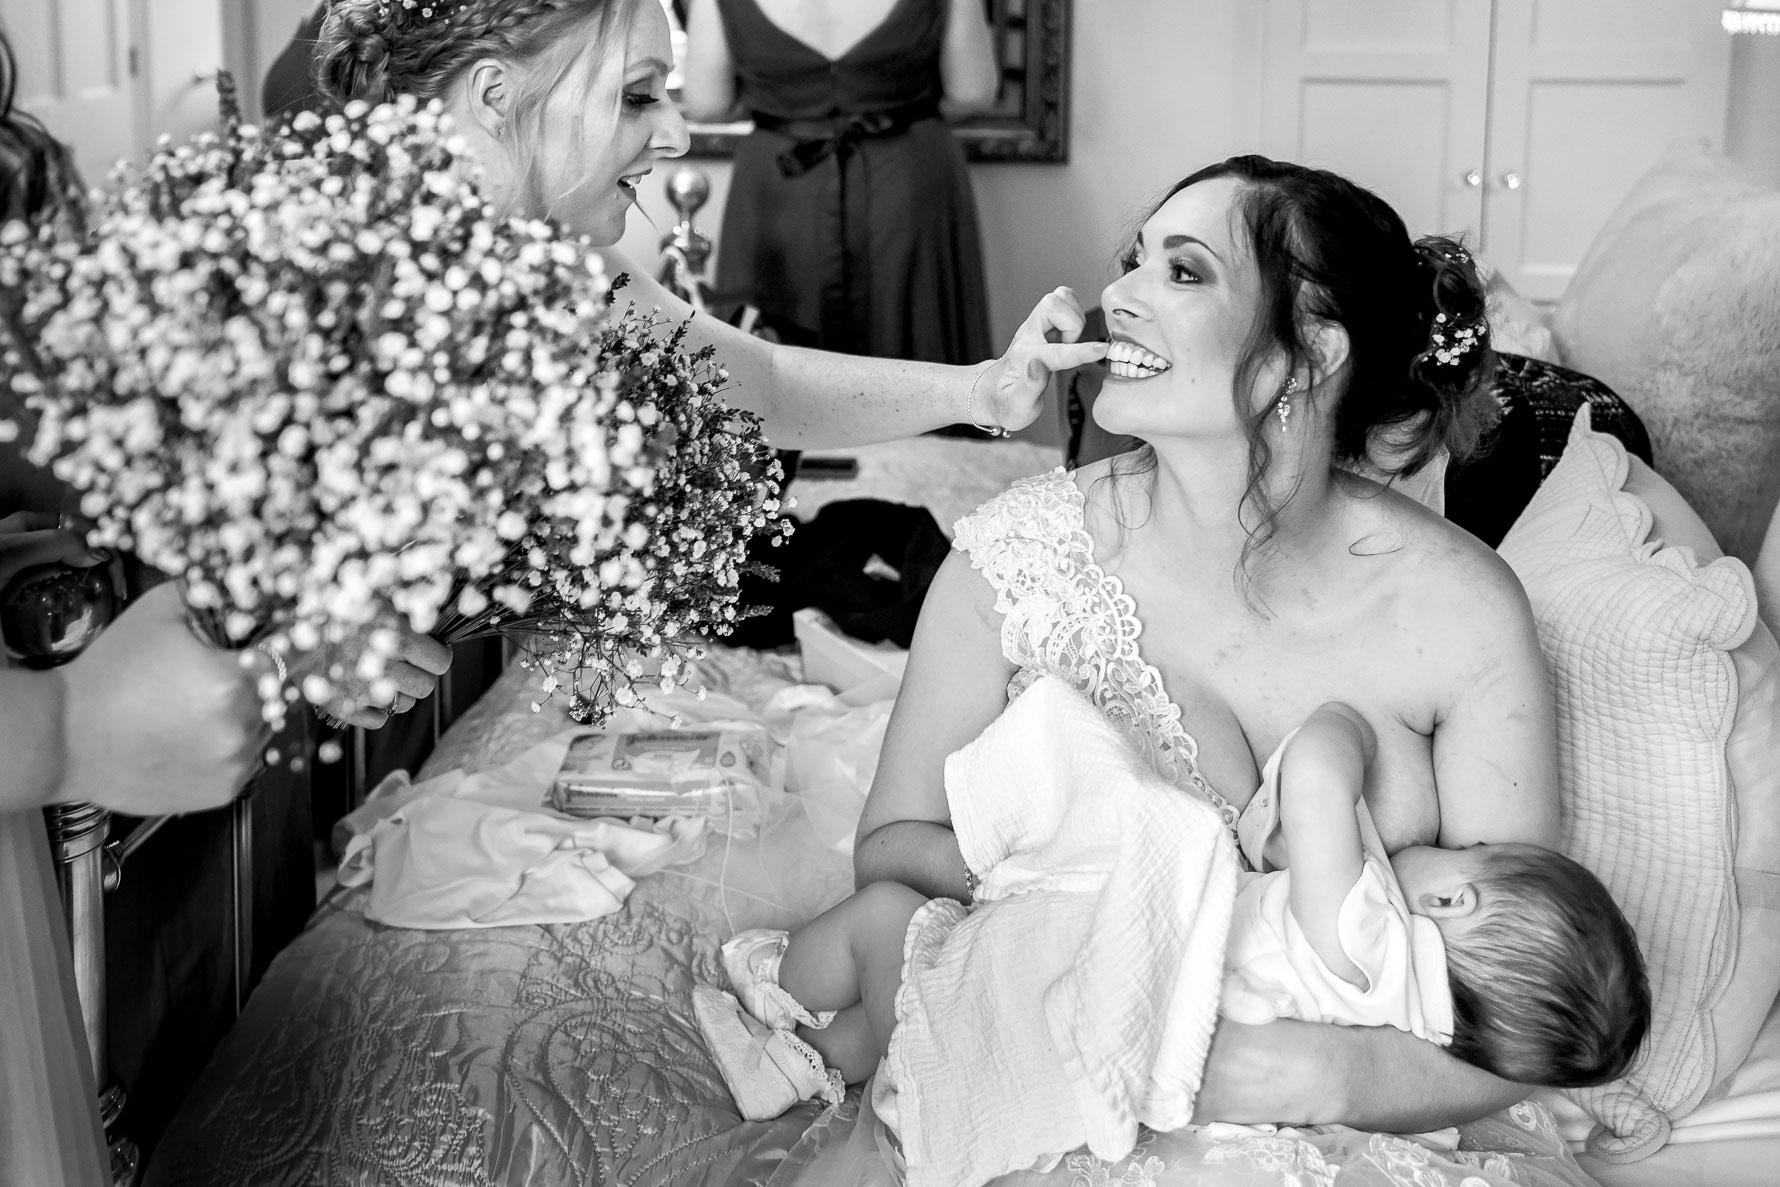 bride breastfeding her baby at her wedding